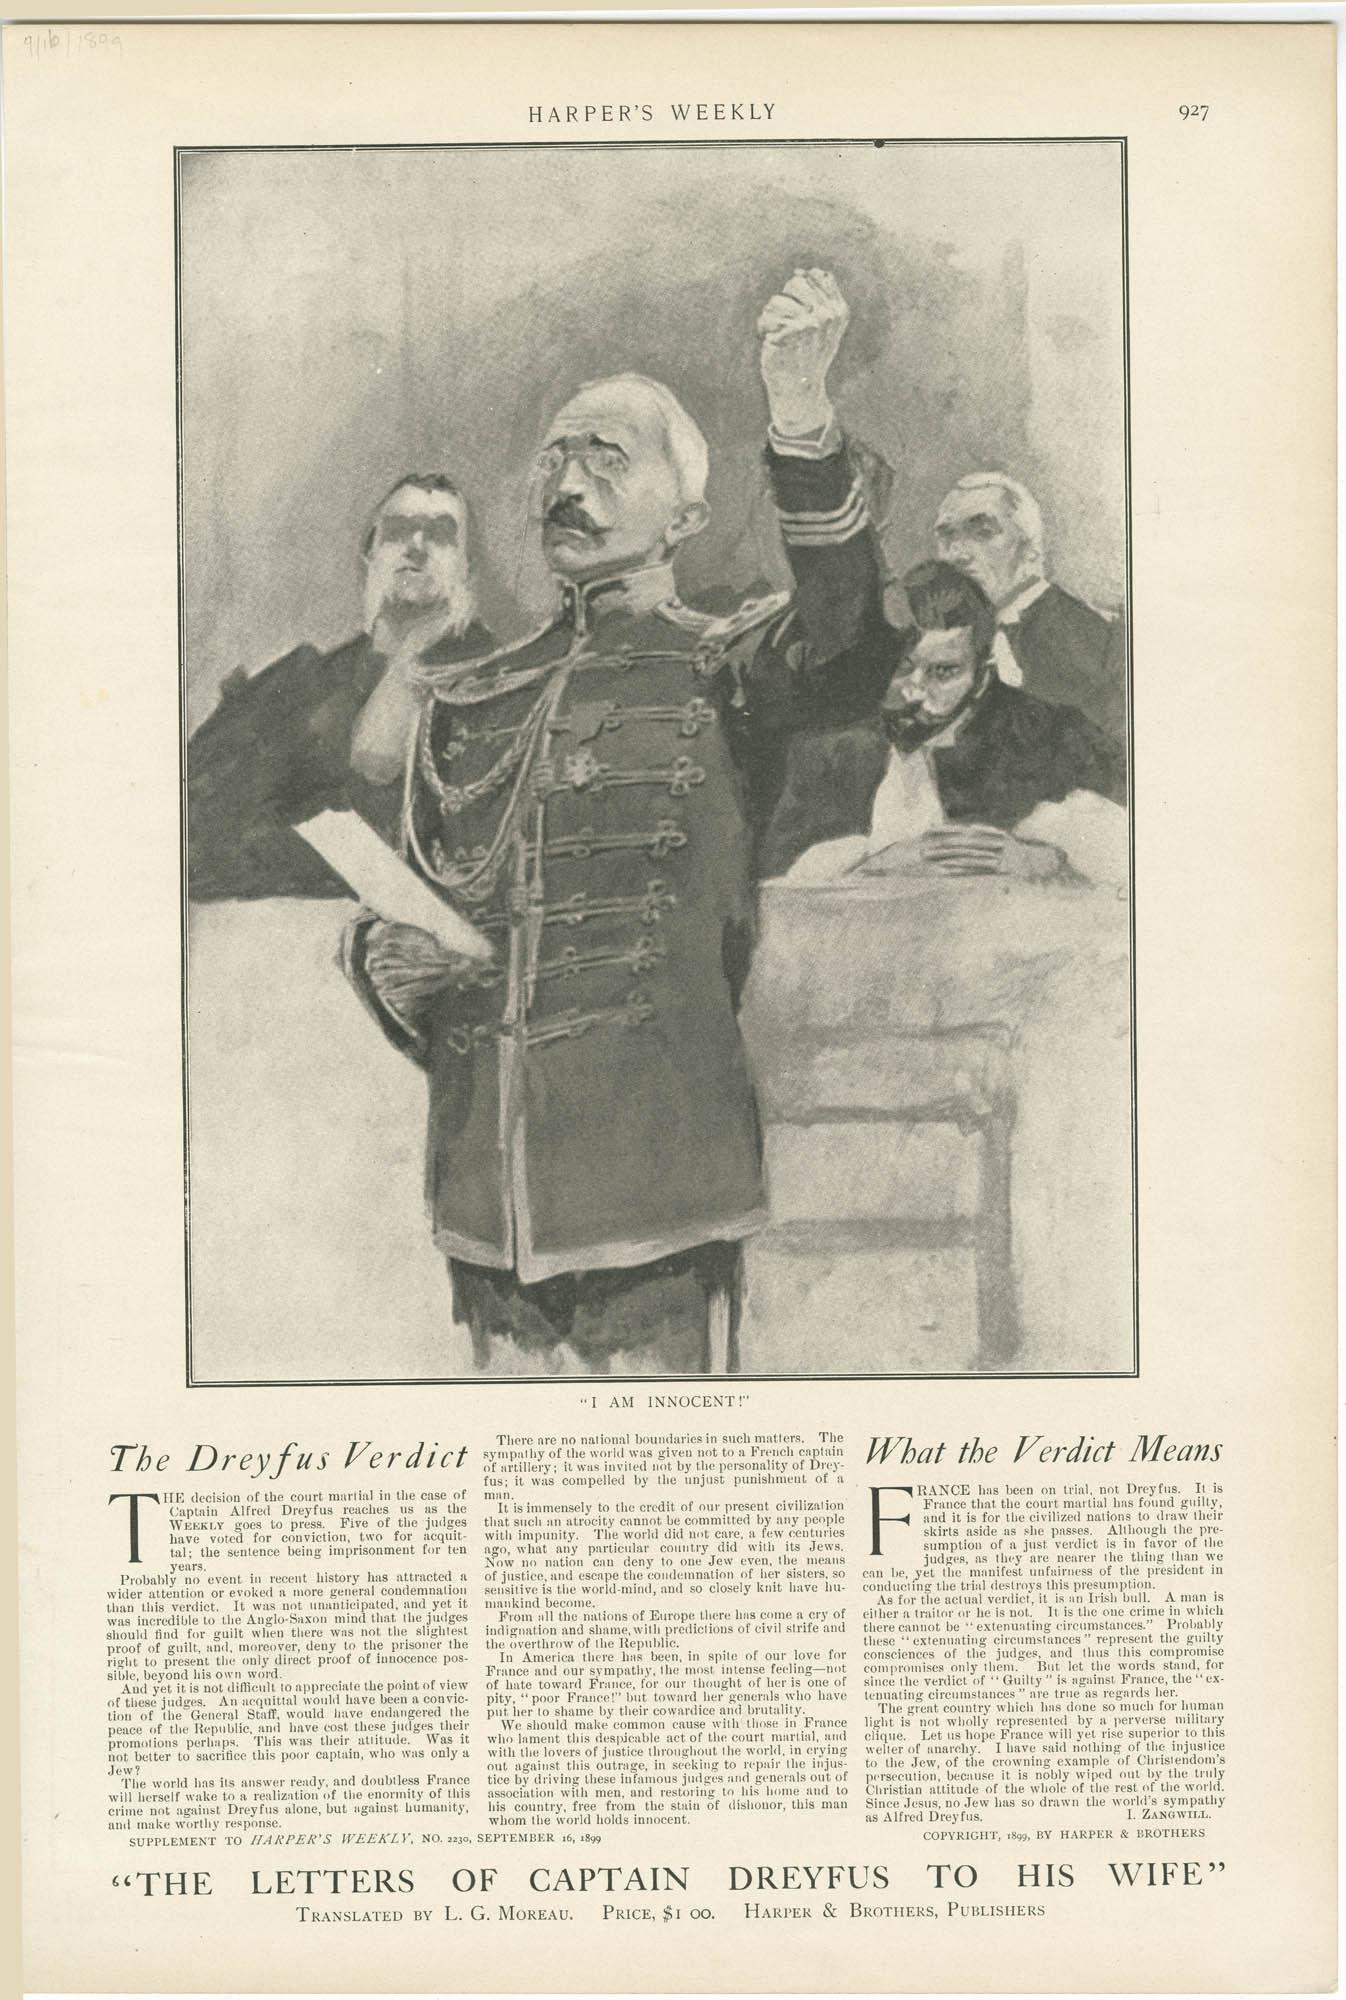 The Dreyfus Verdict